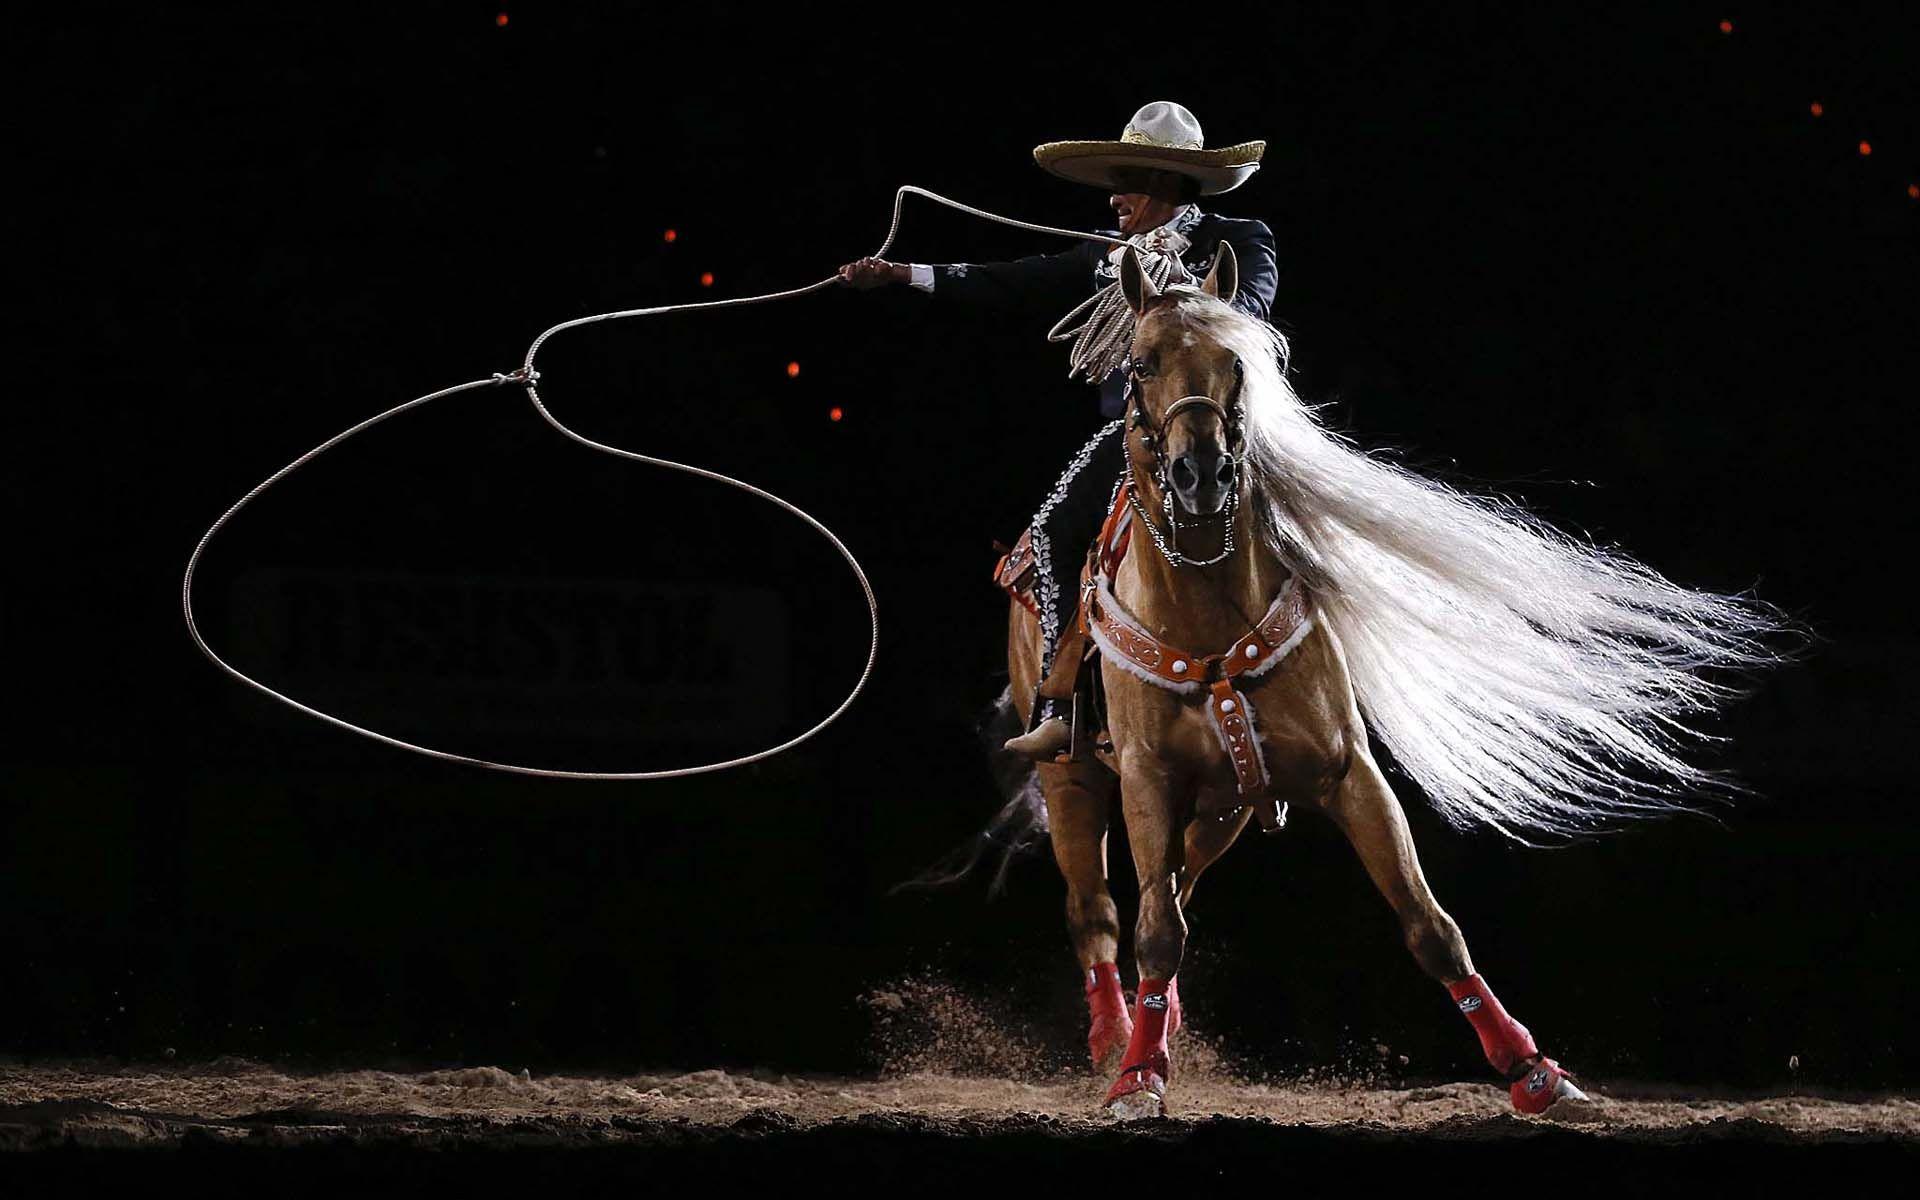 Rodeo Wallpaper